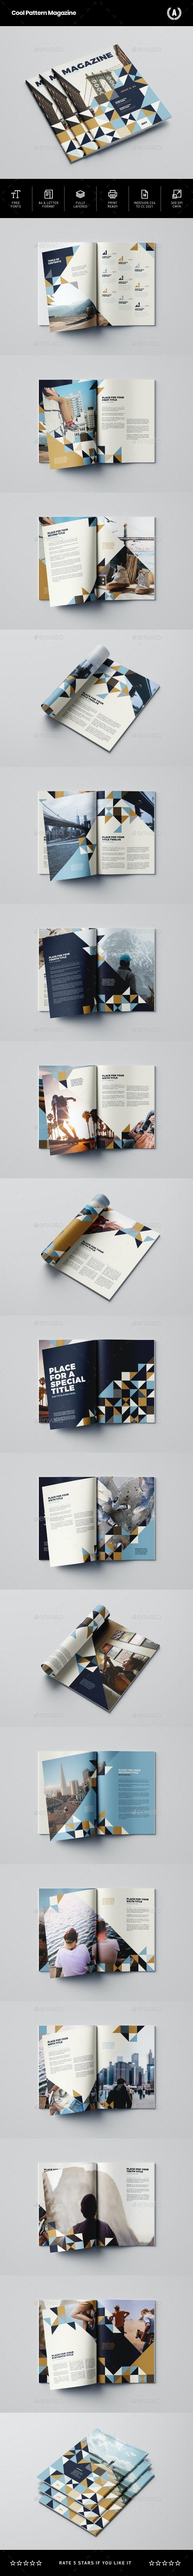 Cool Pattern Magazine - Magazines Print Templates